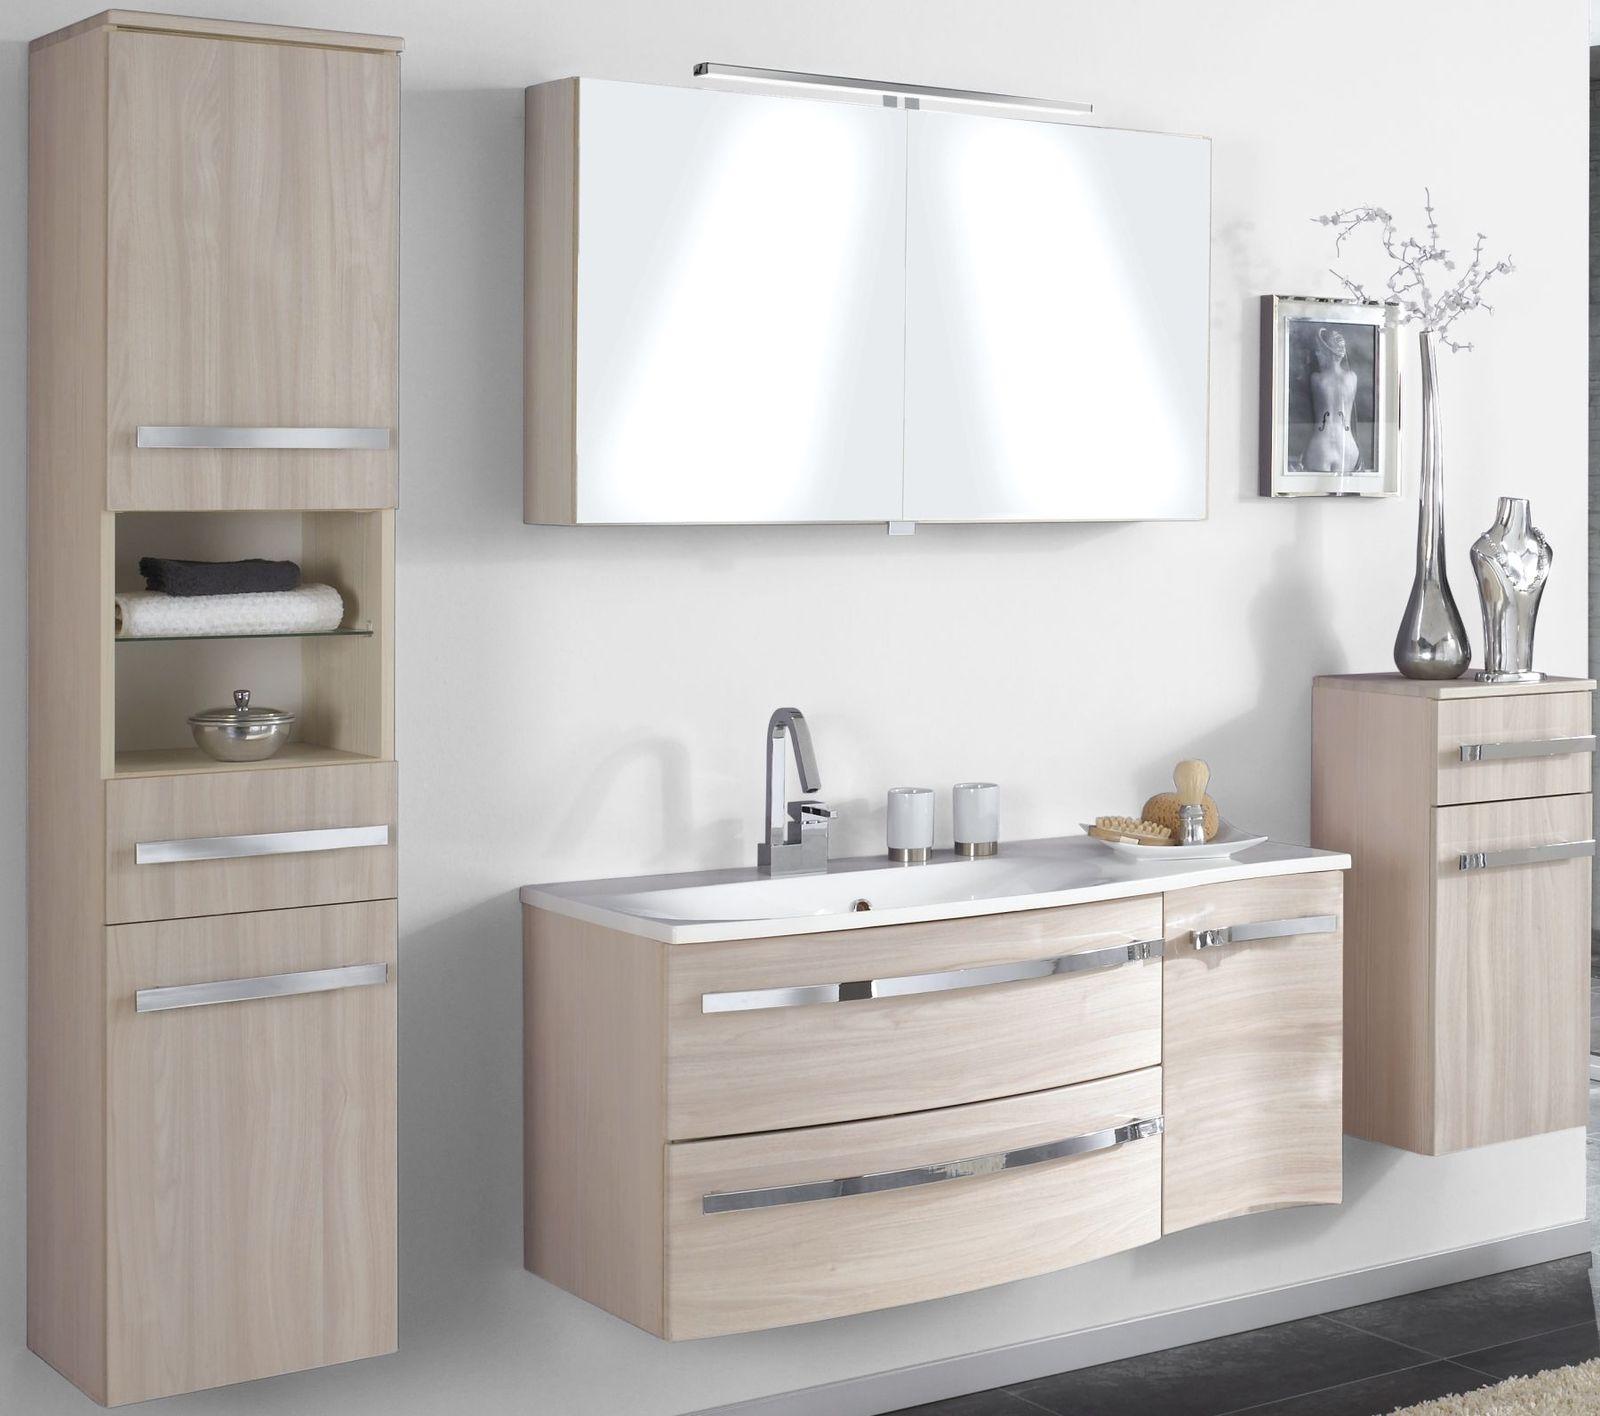 4 tlg Badset Badezimmer komplett Waschplatz 110 cm LED ...